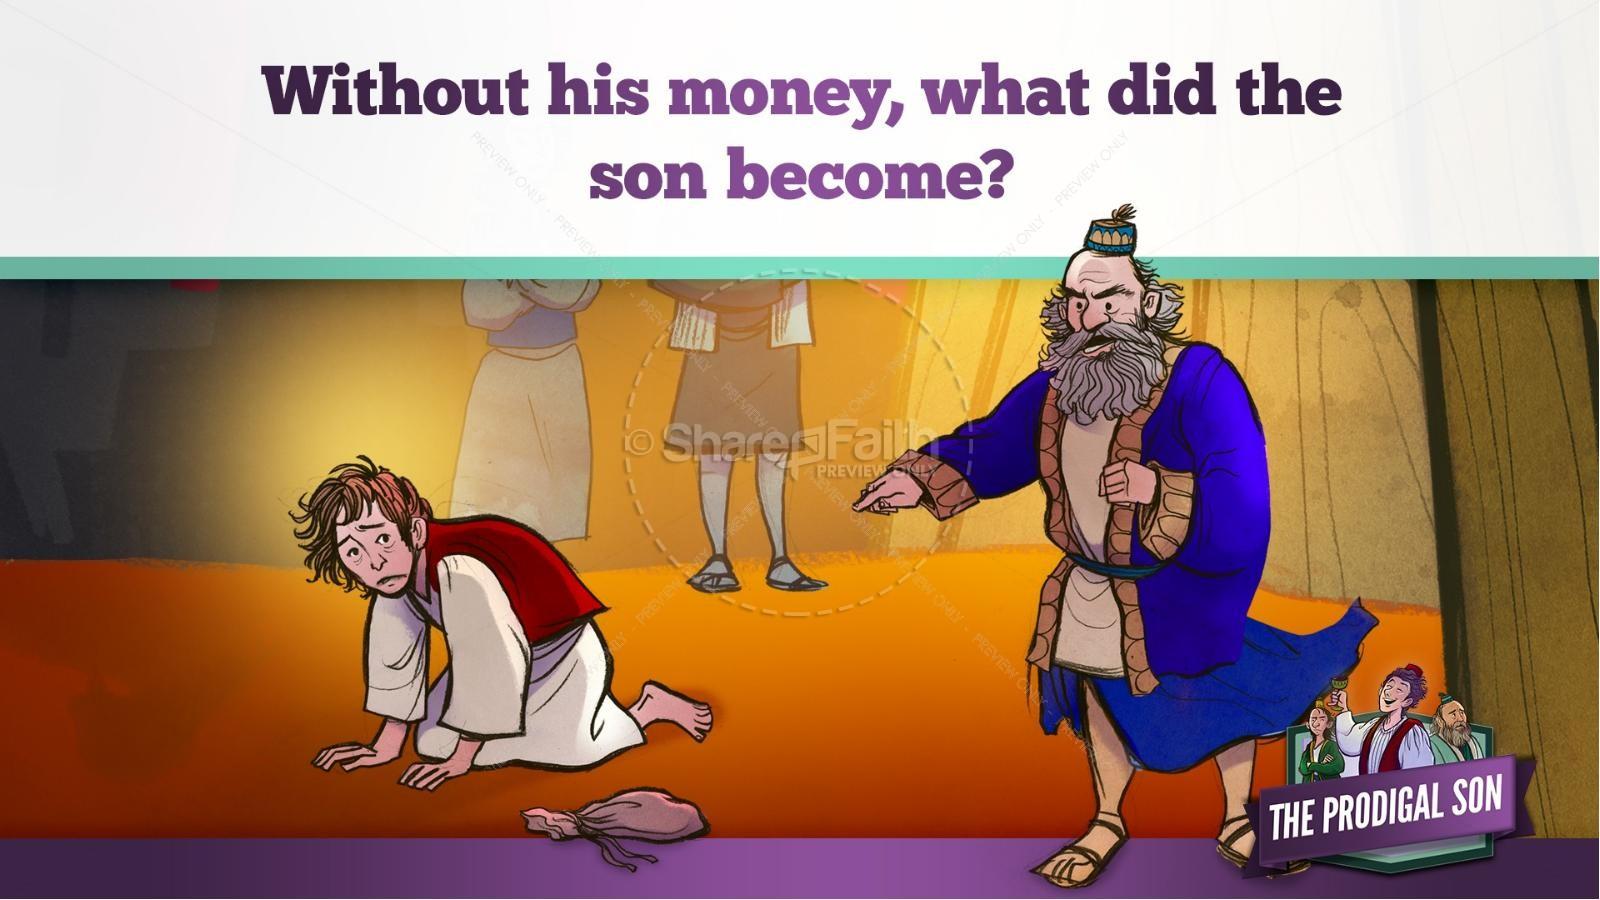 the prodigal son kids bible story